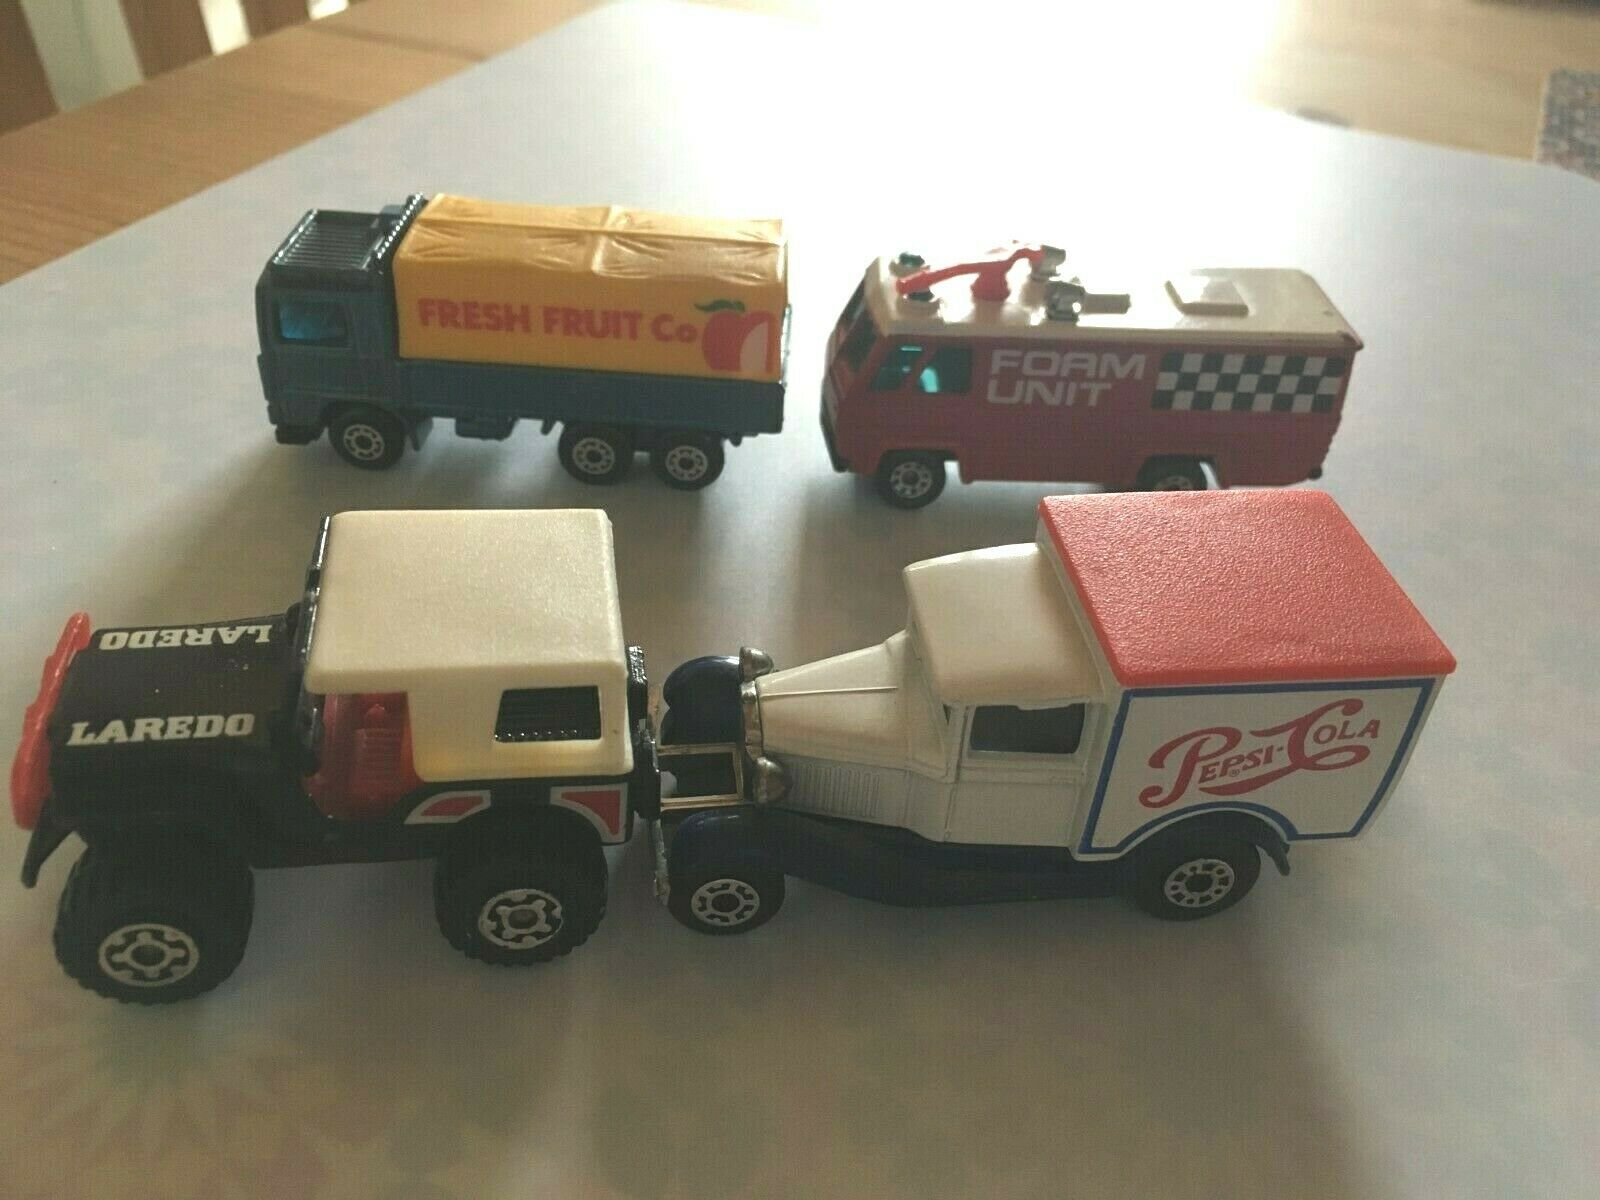 4 x Matchbox liasse 2 x SUPERFAST 1 x rouge Airport 1981 + 1 x Fresh Fruit 1983